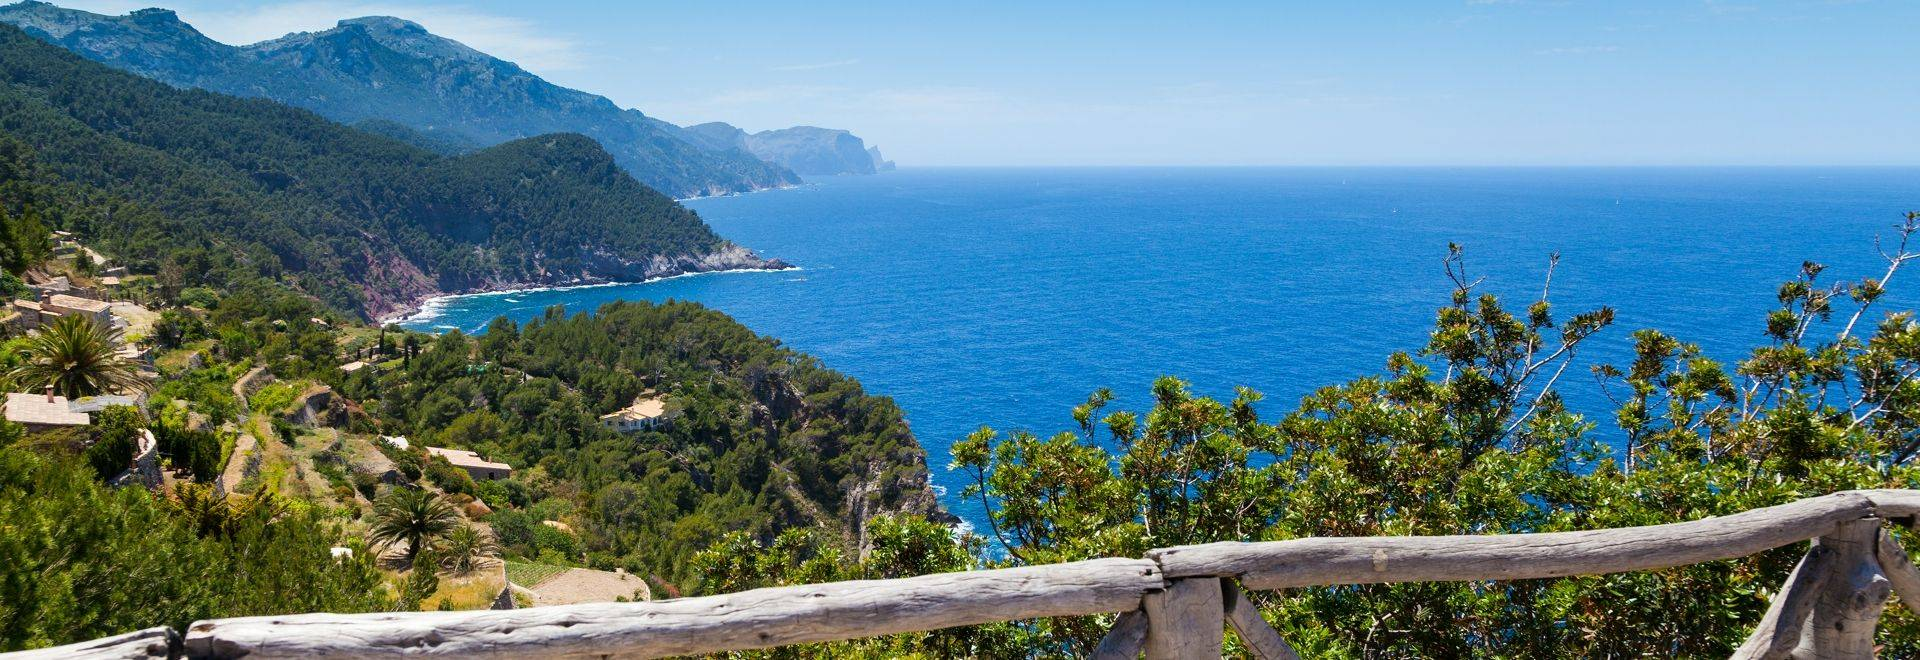 Shutterstock 181058267 Mallorcan Coastline